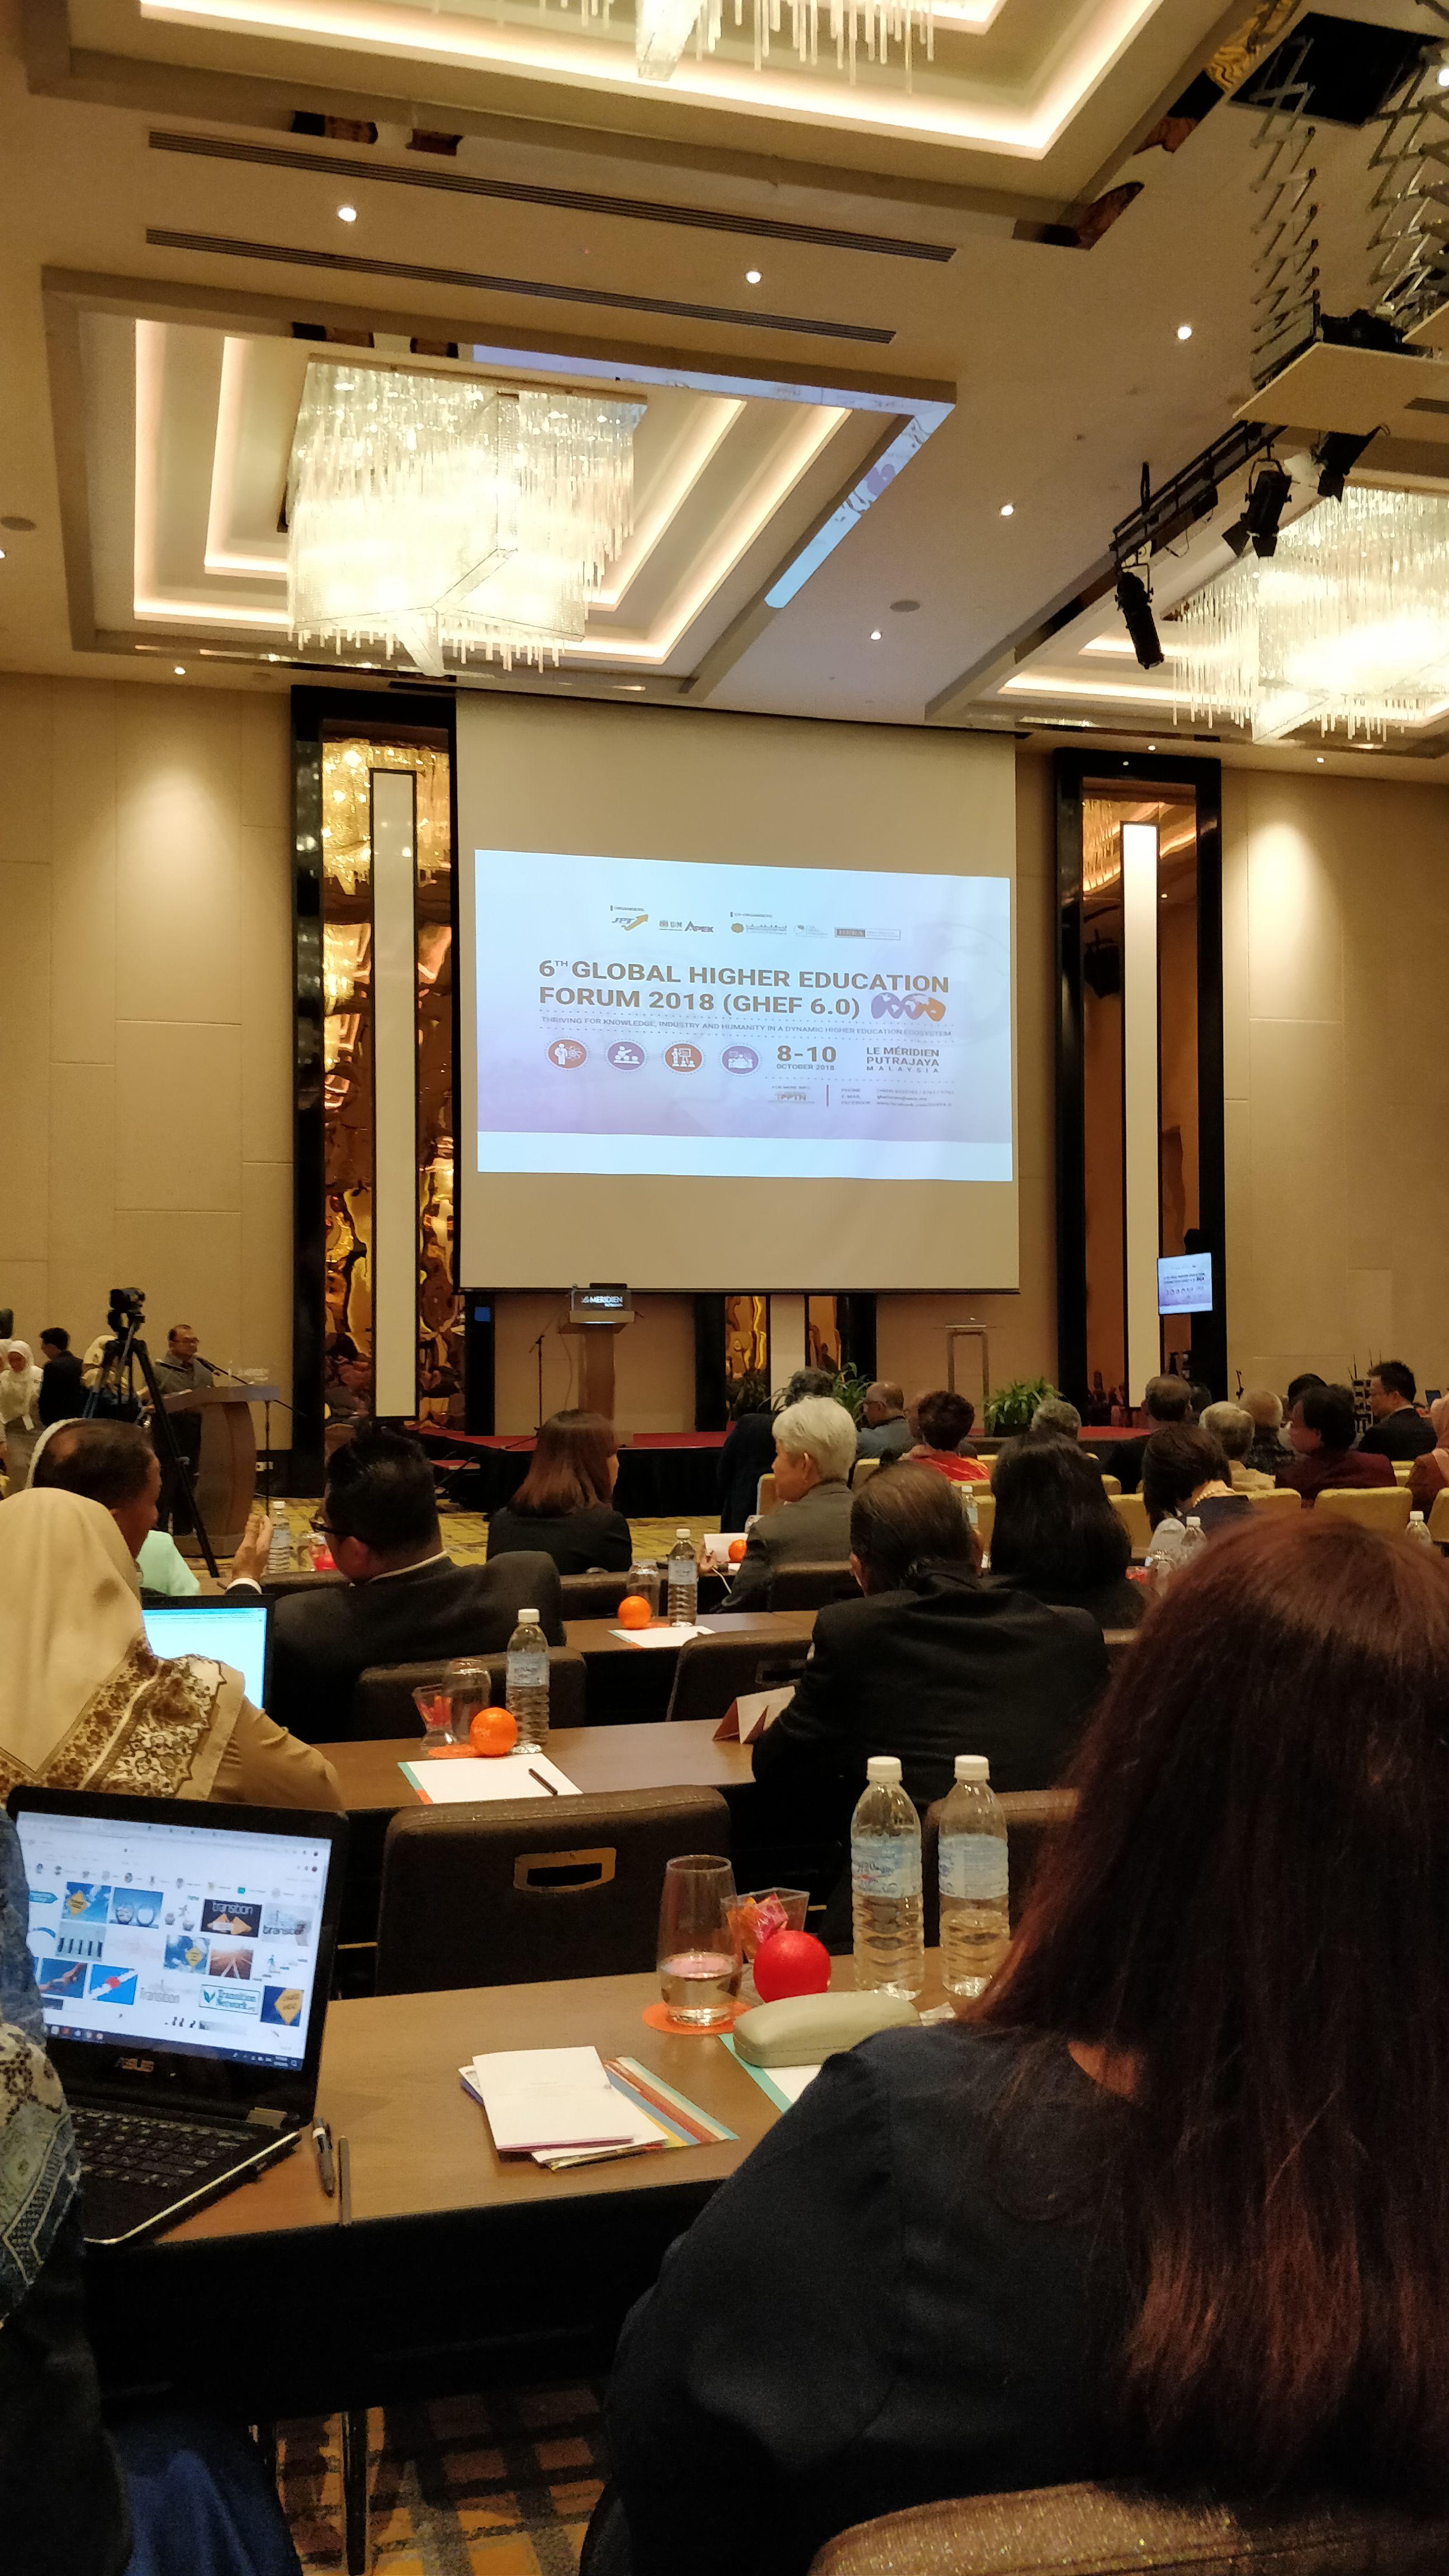 6th Global Higher Education Forum (GHEF 6.0)